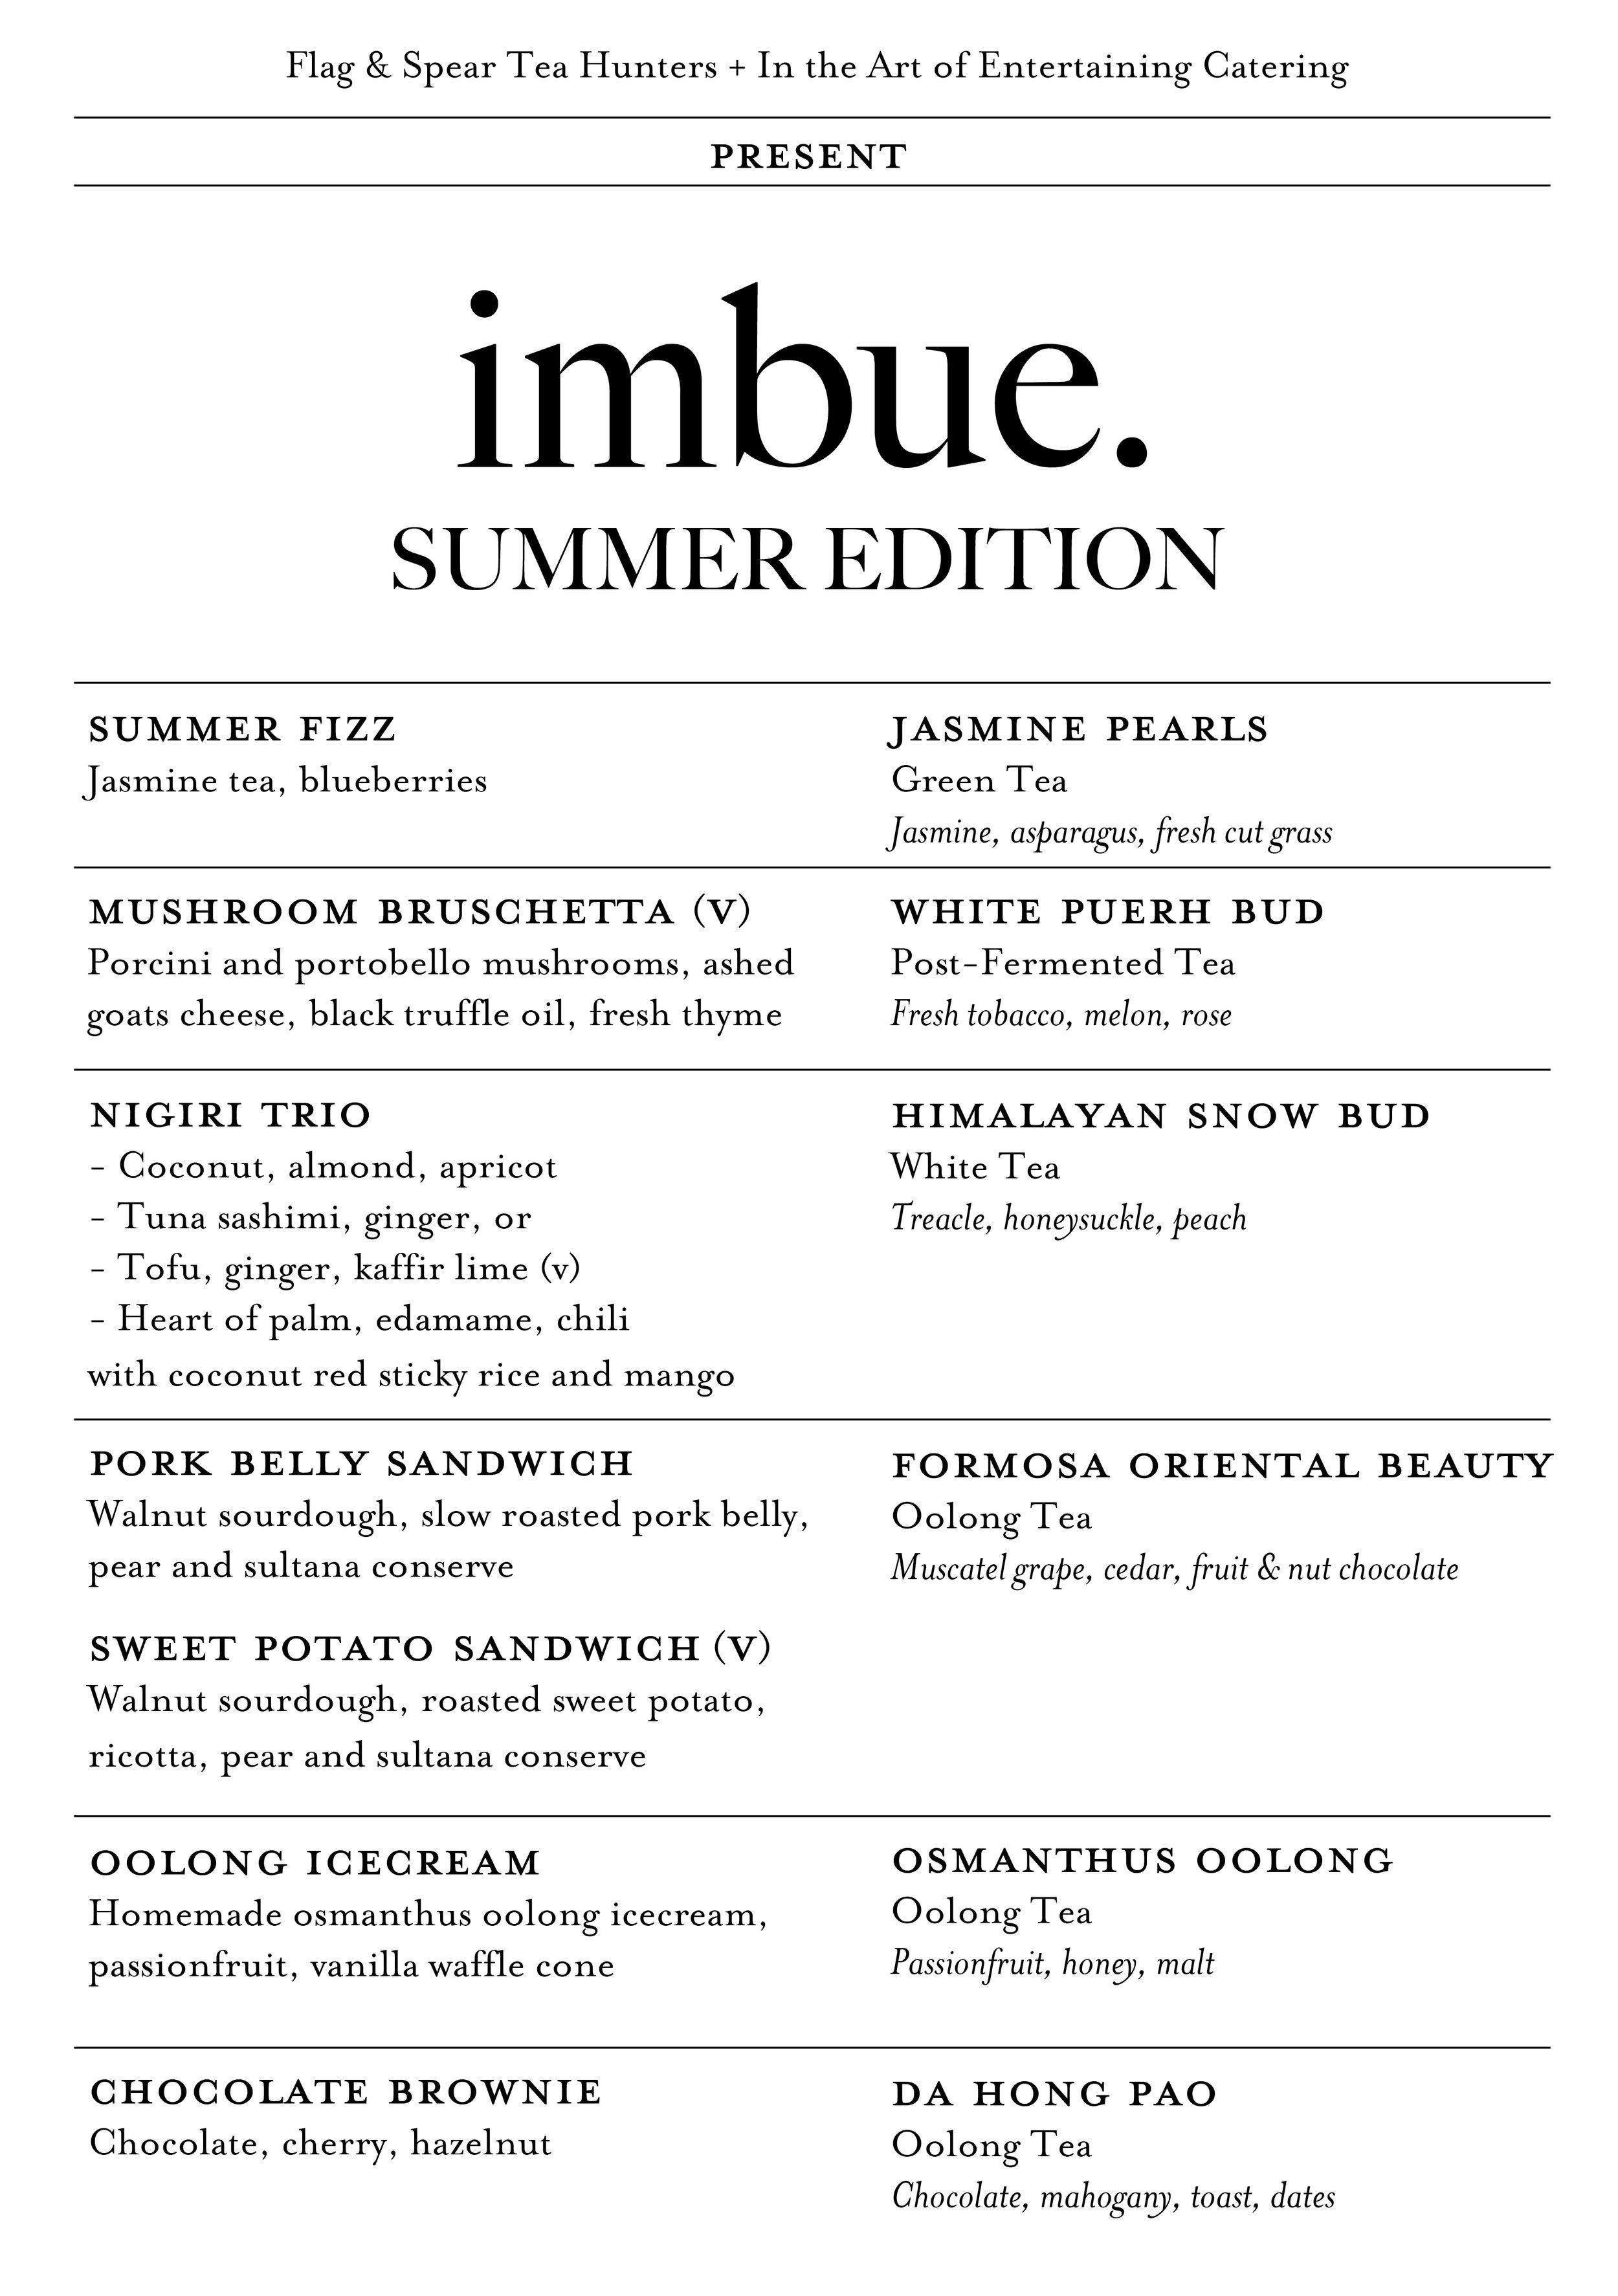 Single - Summer Edition1.jpg